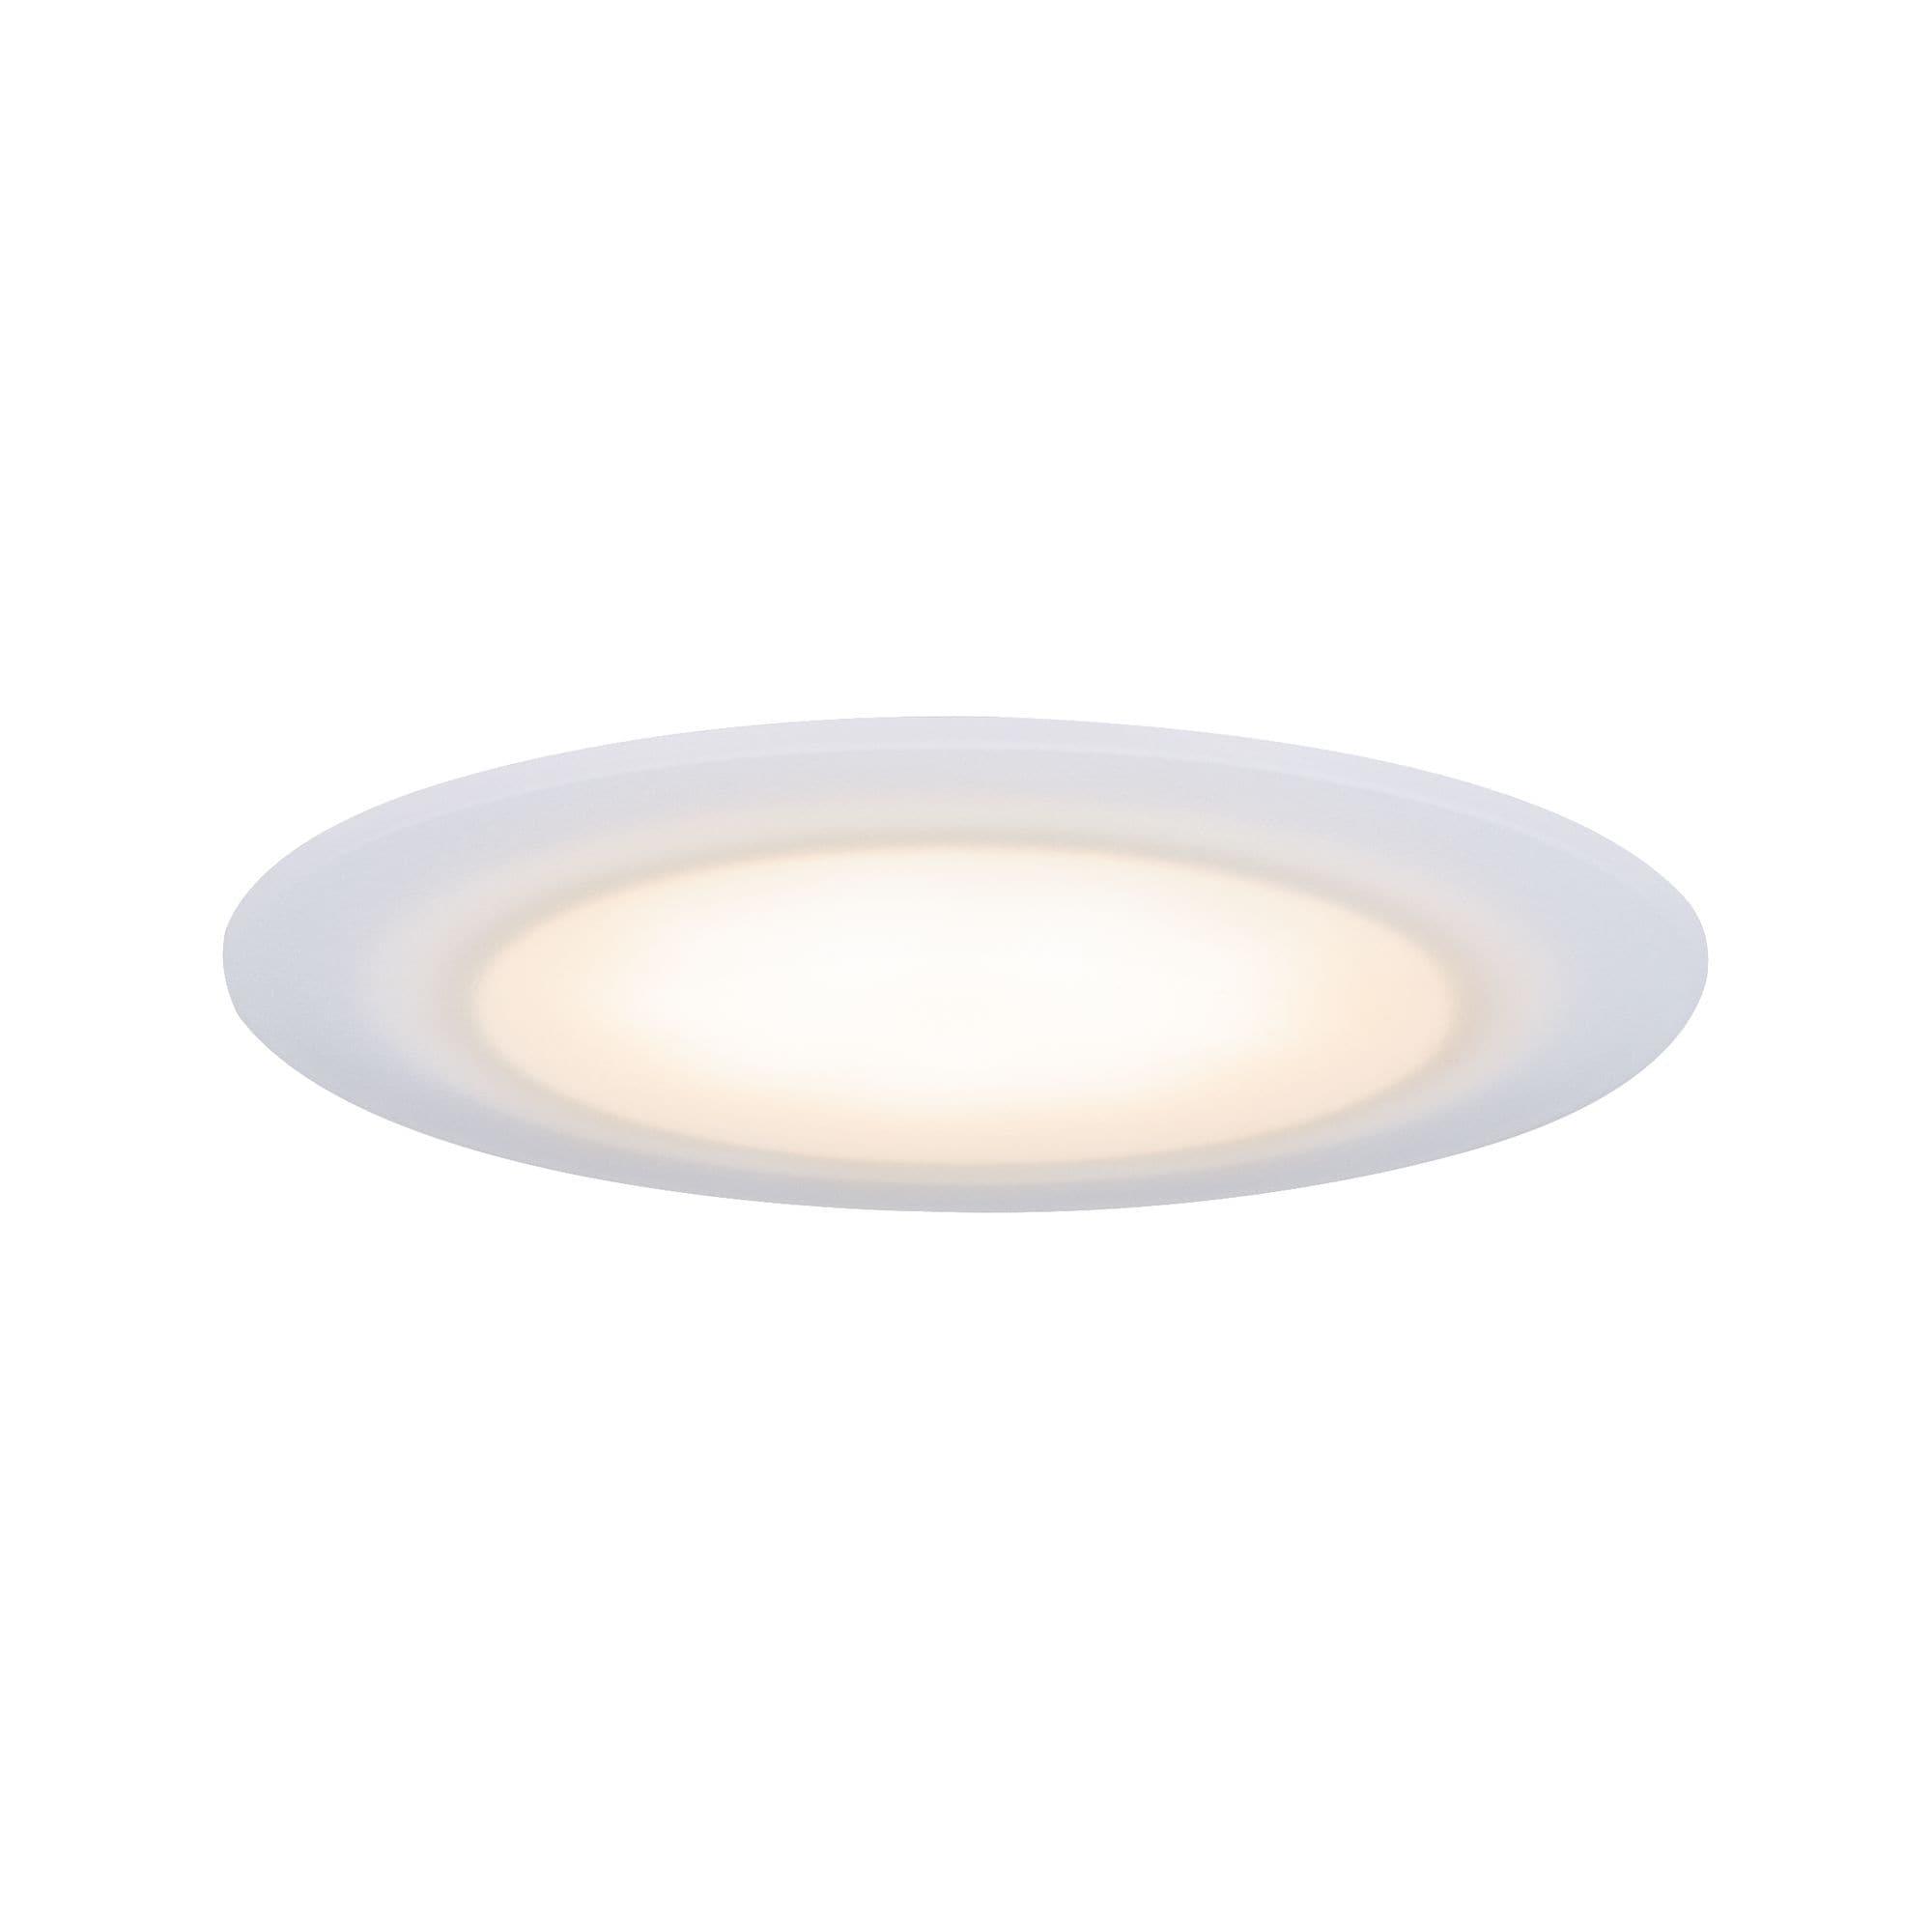 Paulmann LED Einbaustrahler Suon WarmDim 2000-2700K 6,5W 230 V Satiniert, 1 St., Warmweiß